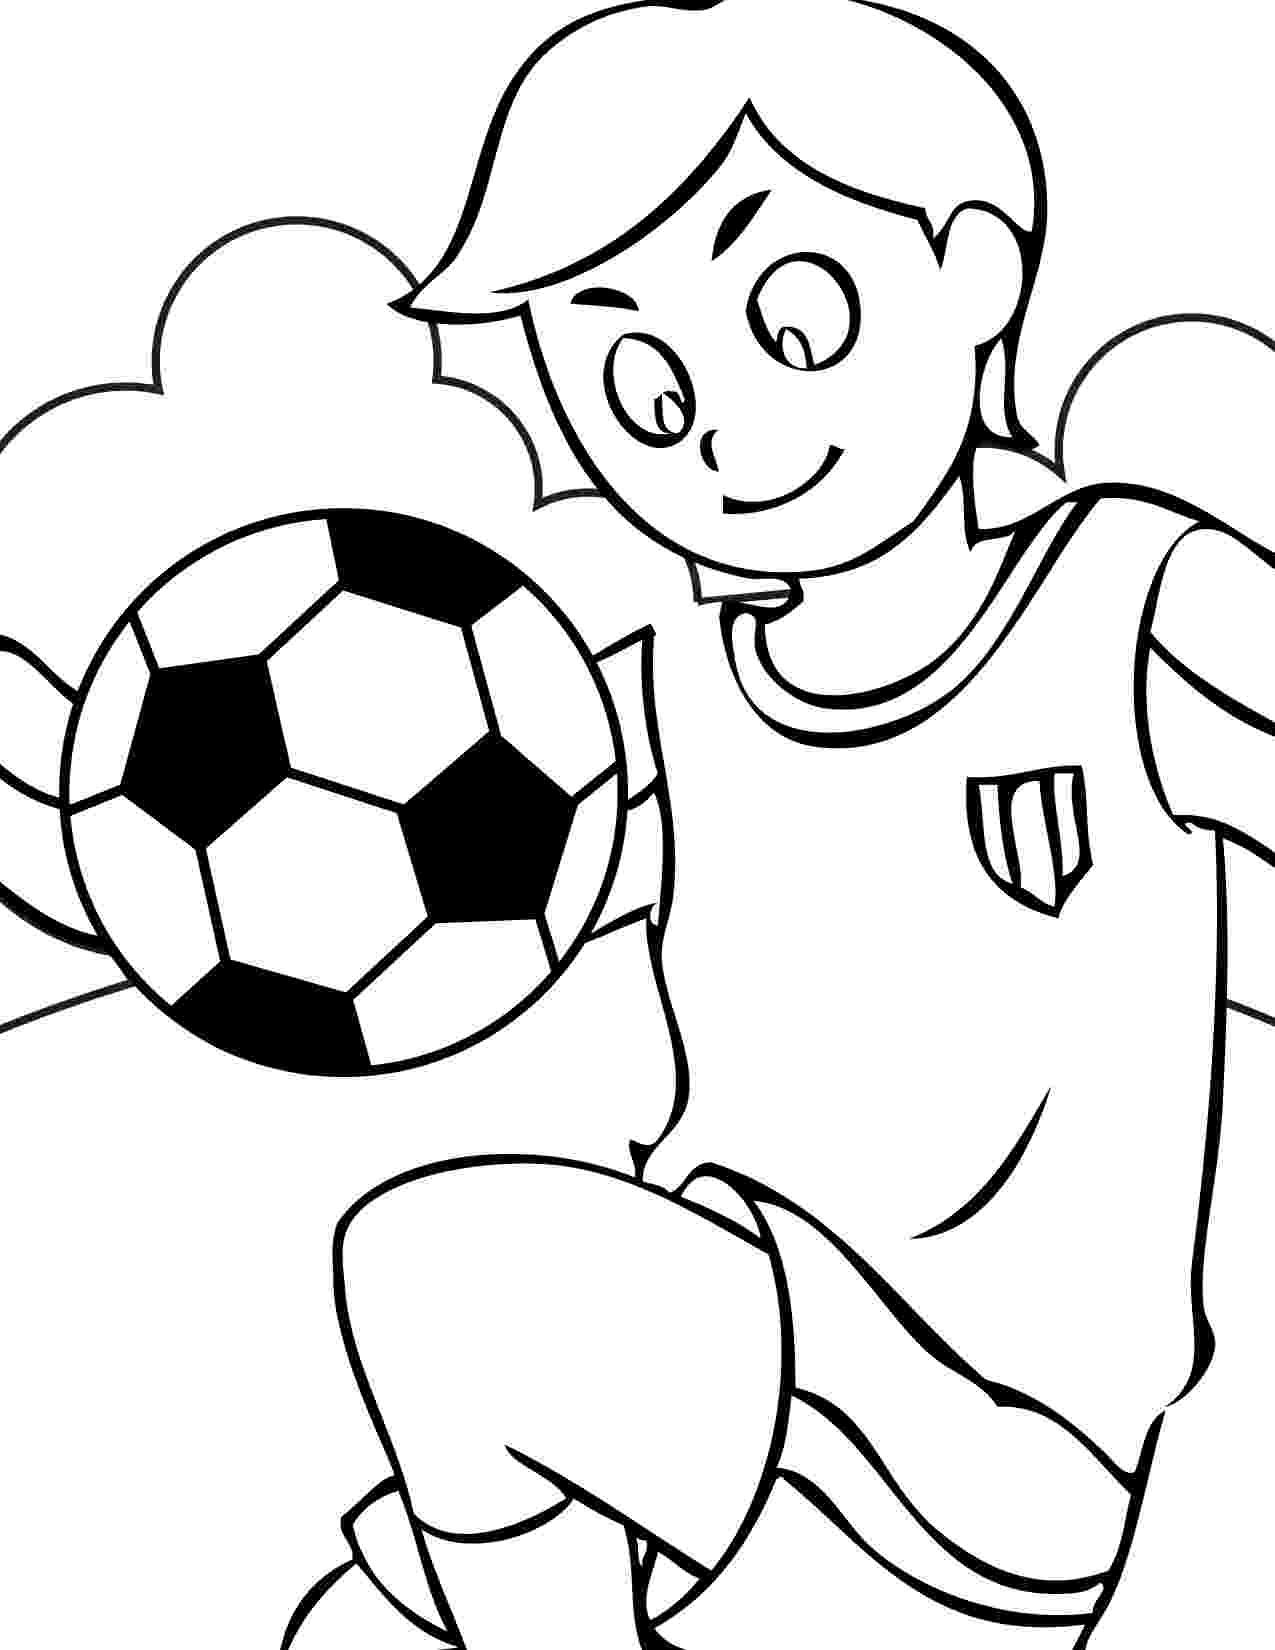 free sports coloring sheets free printable sports coloring pages for kids sports coloring sheets free